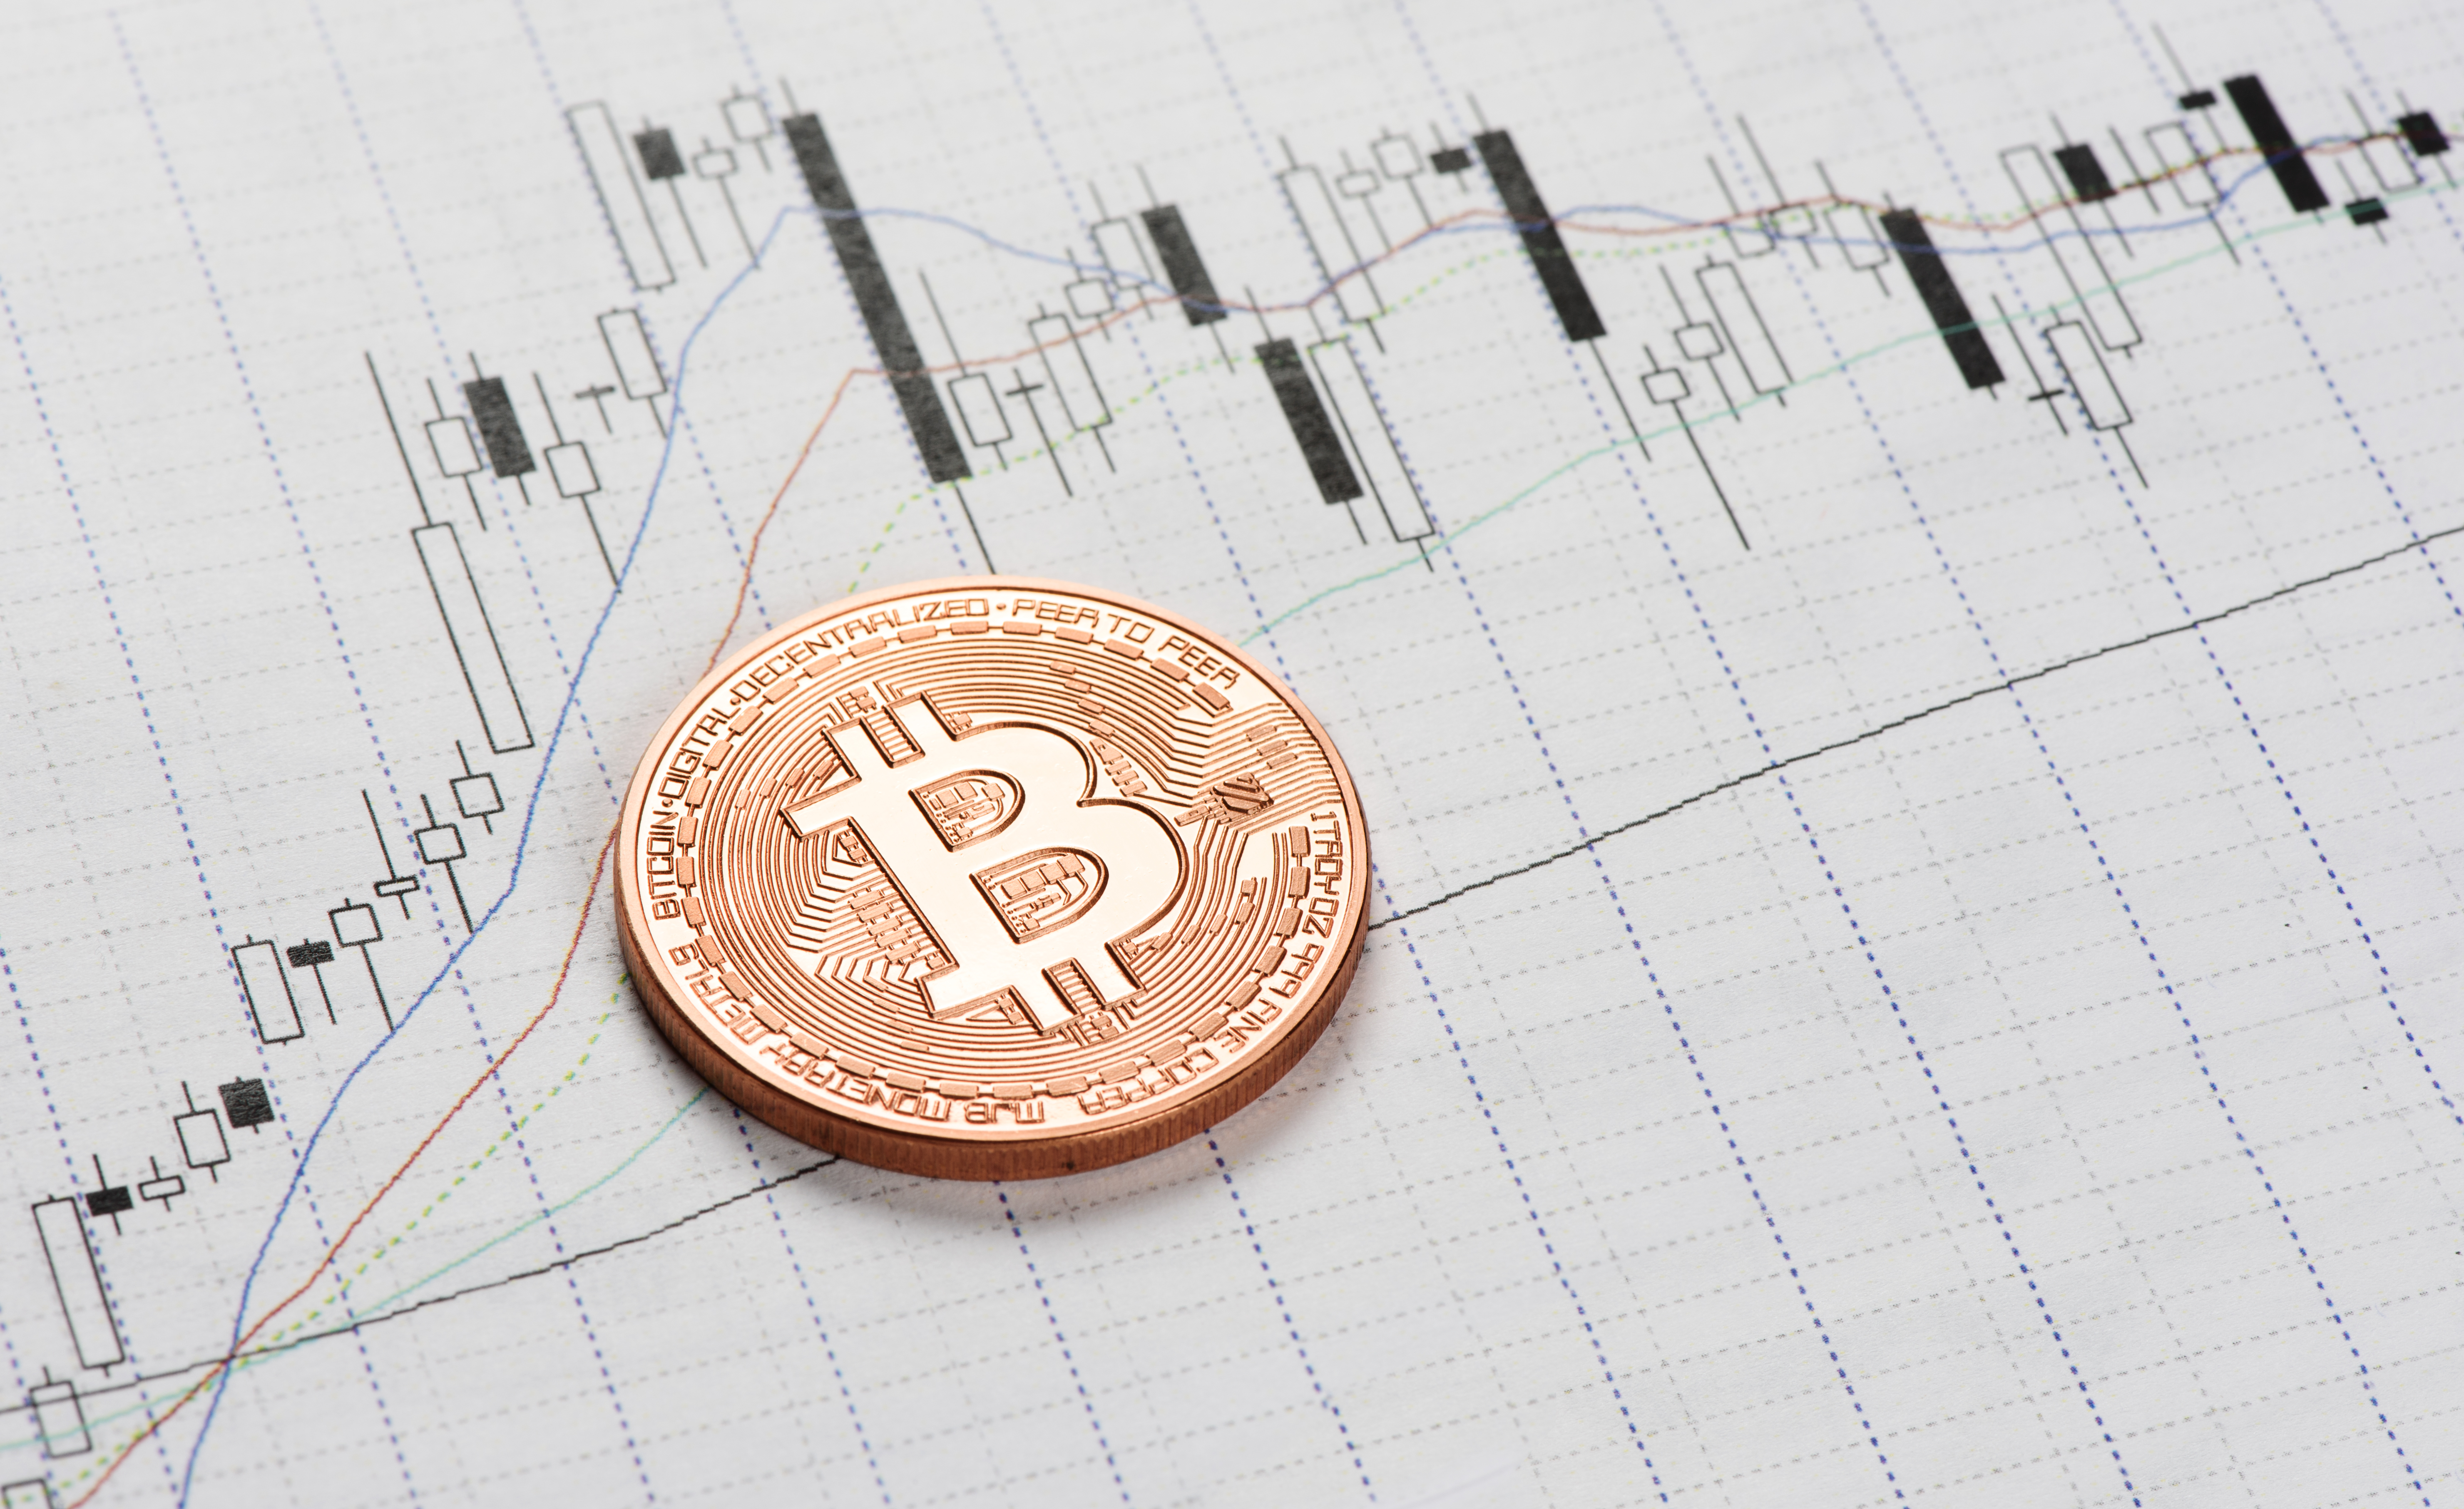 Bitcoin dice invest